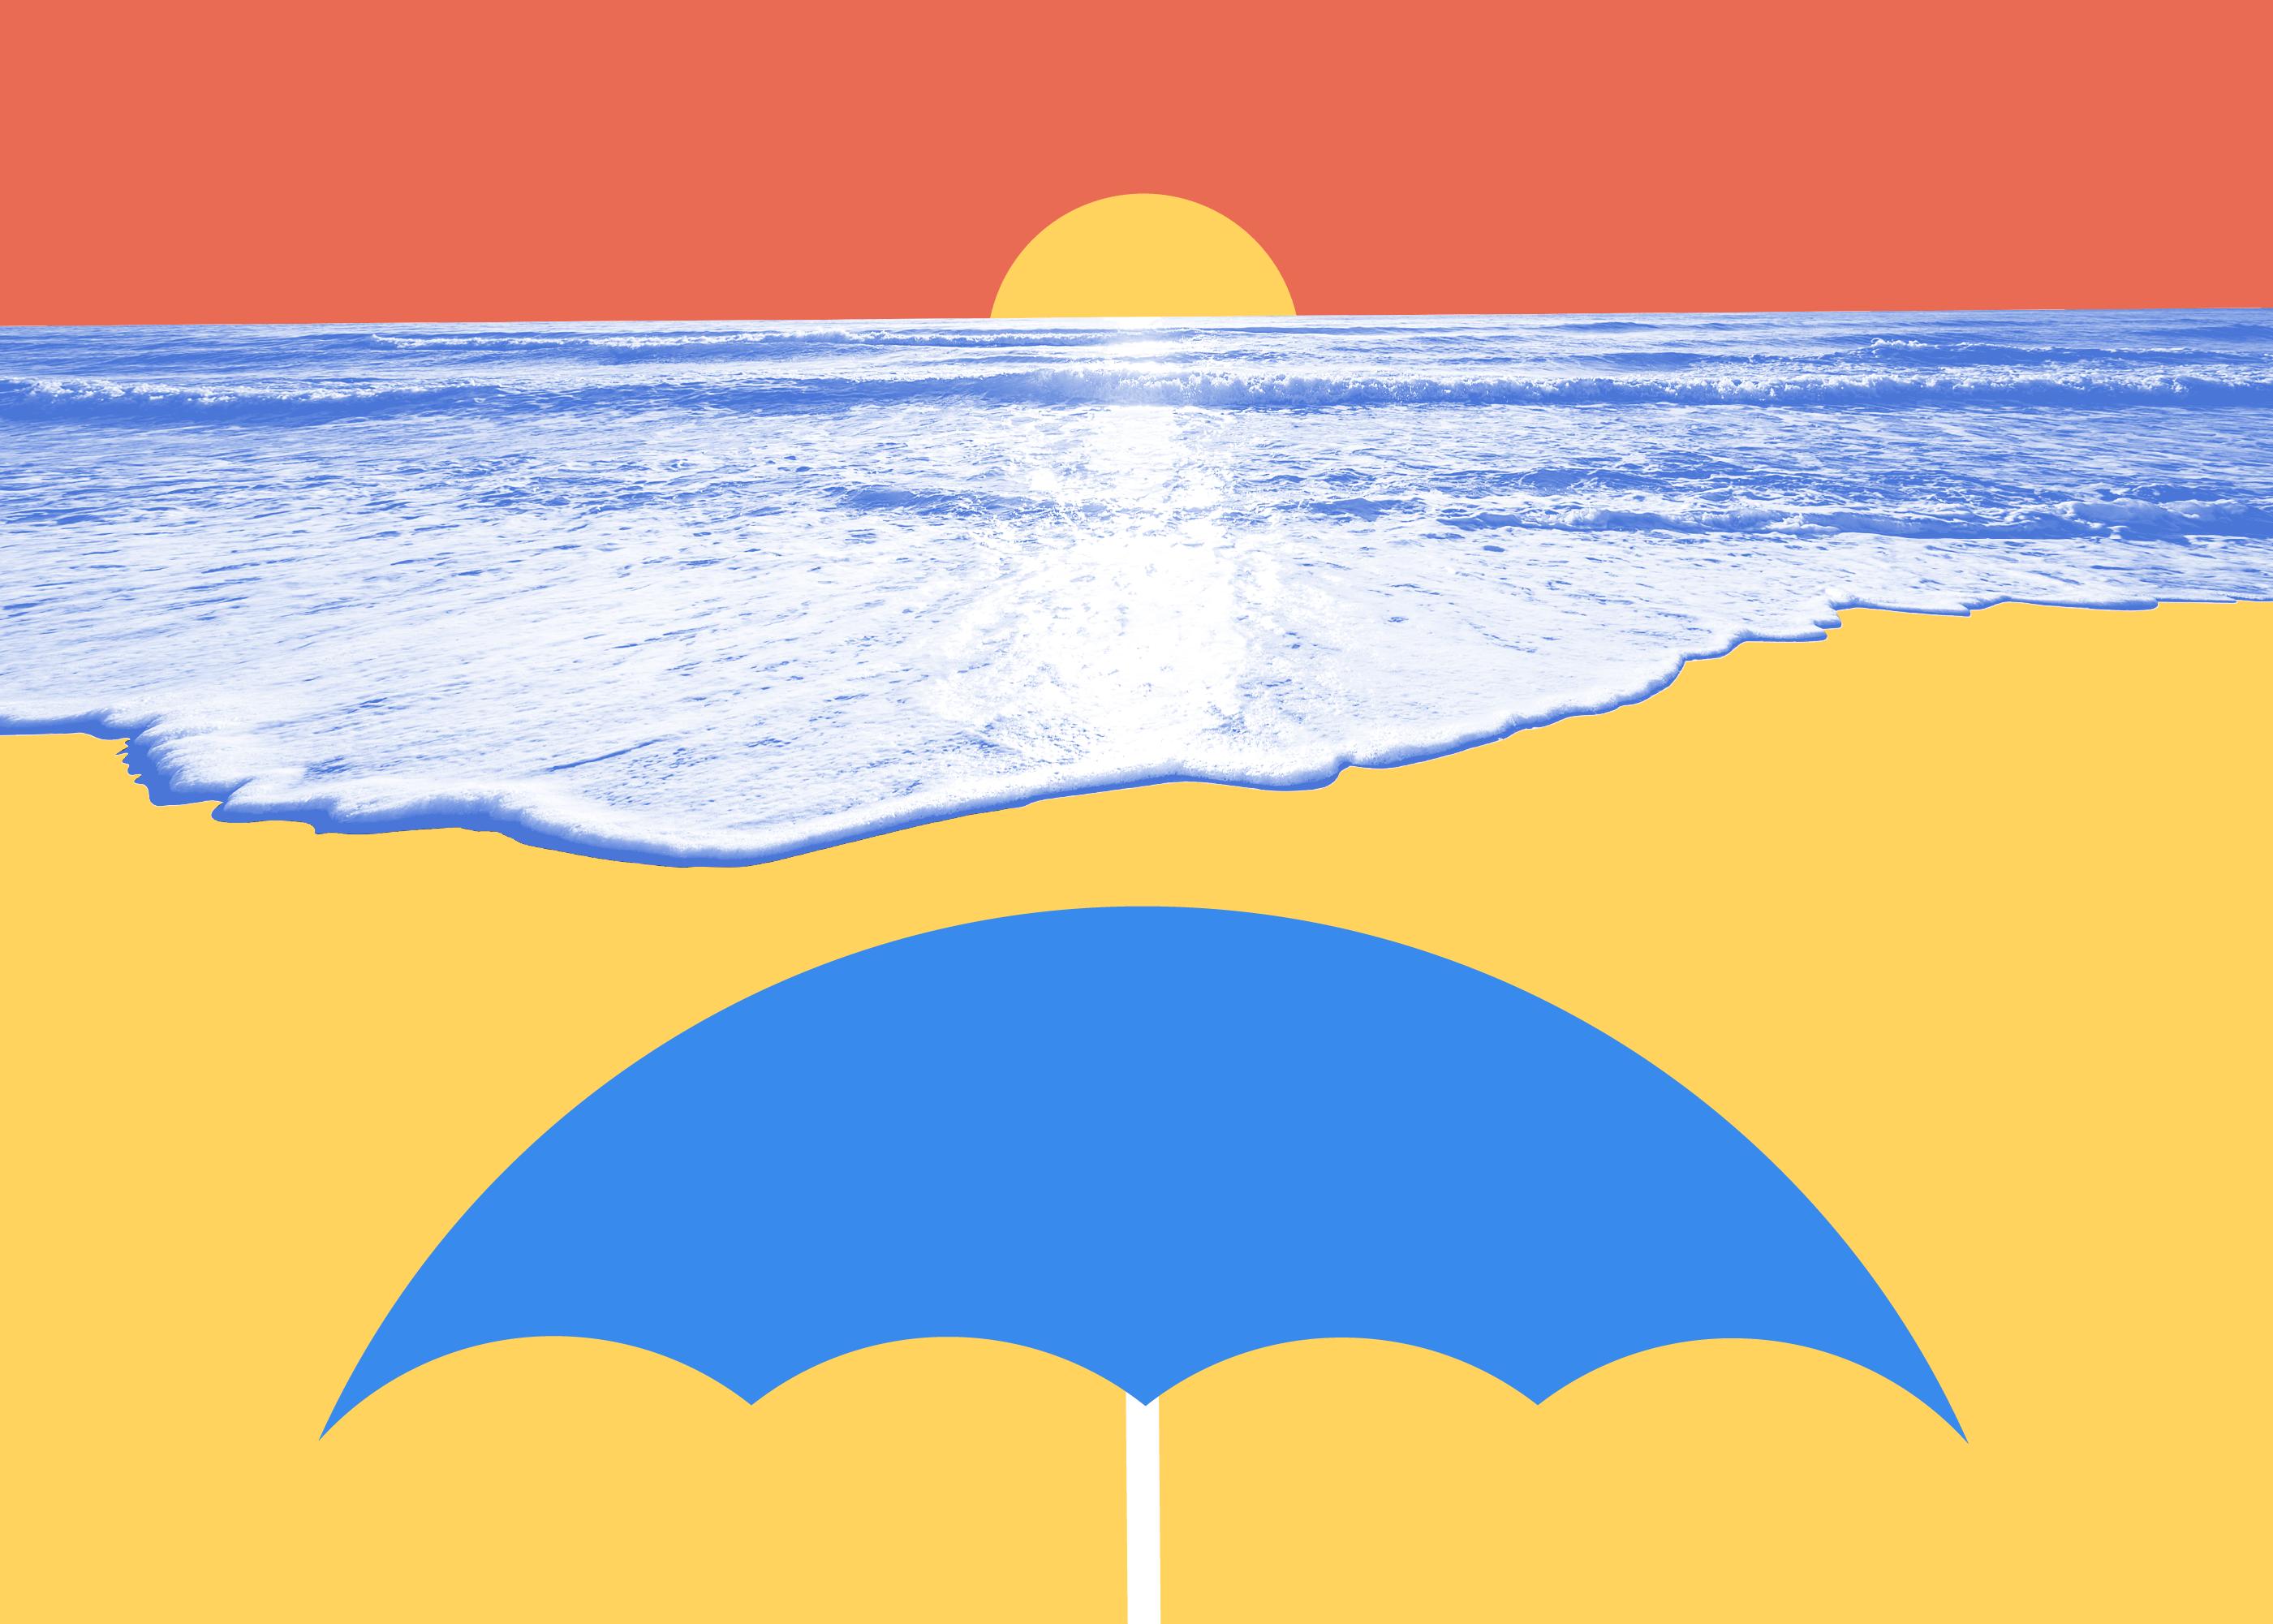 Illustrated beach